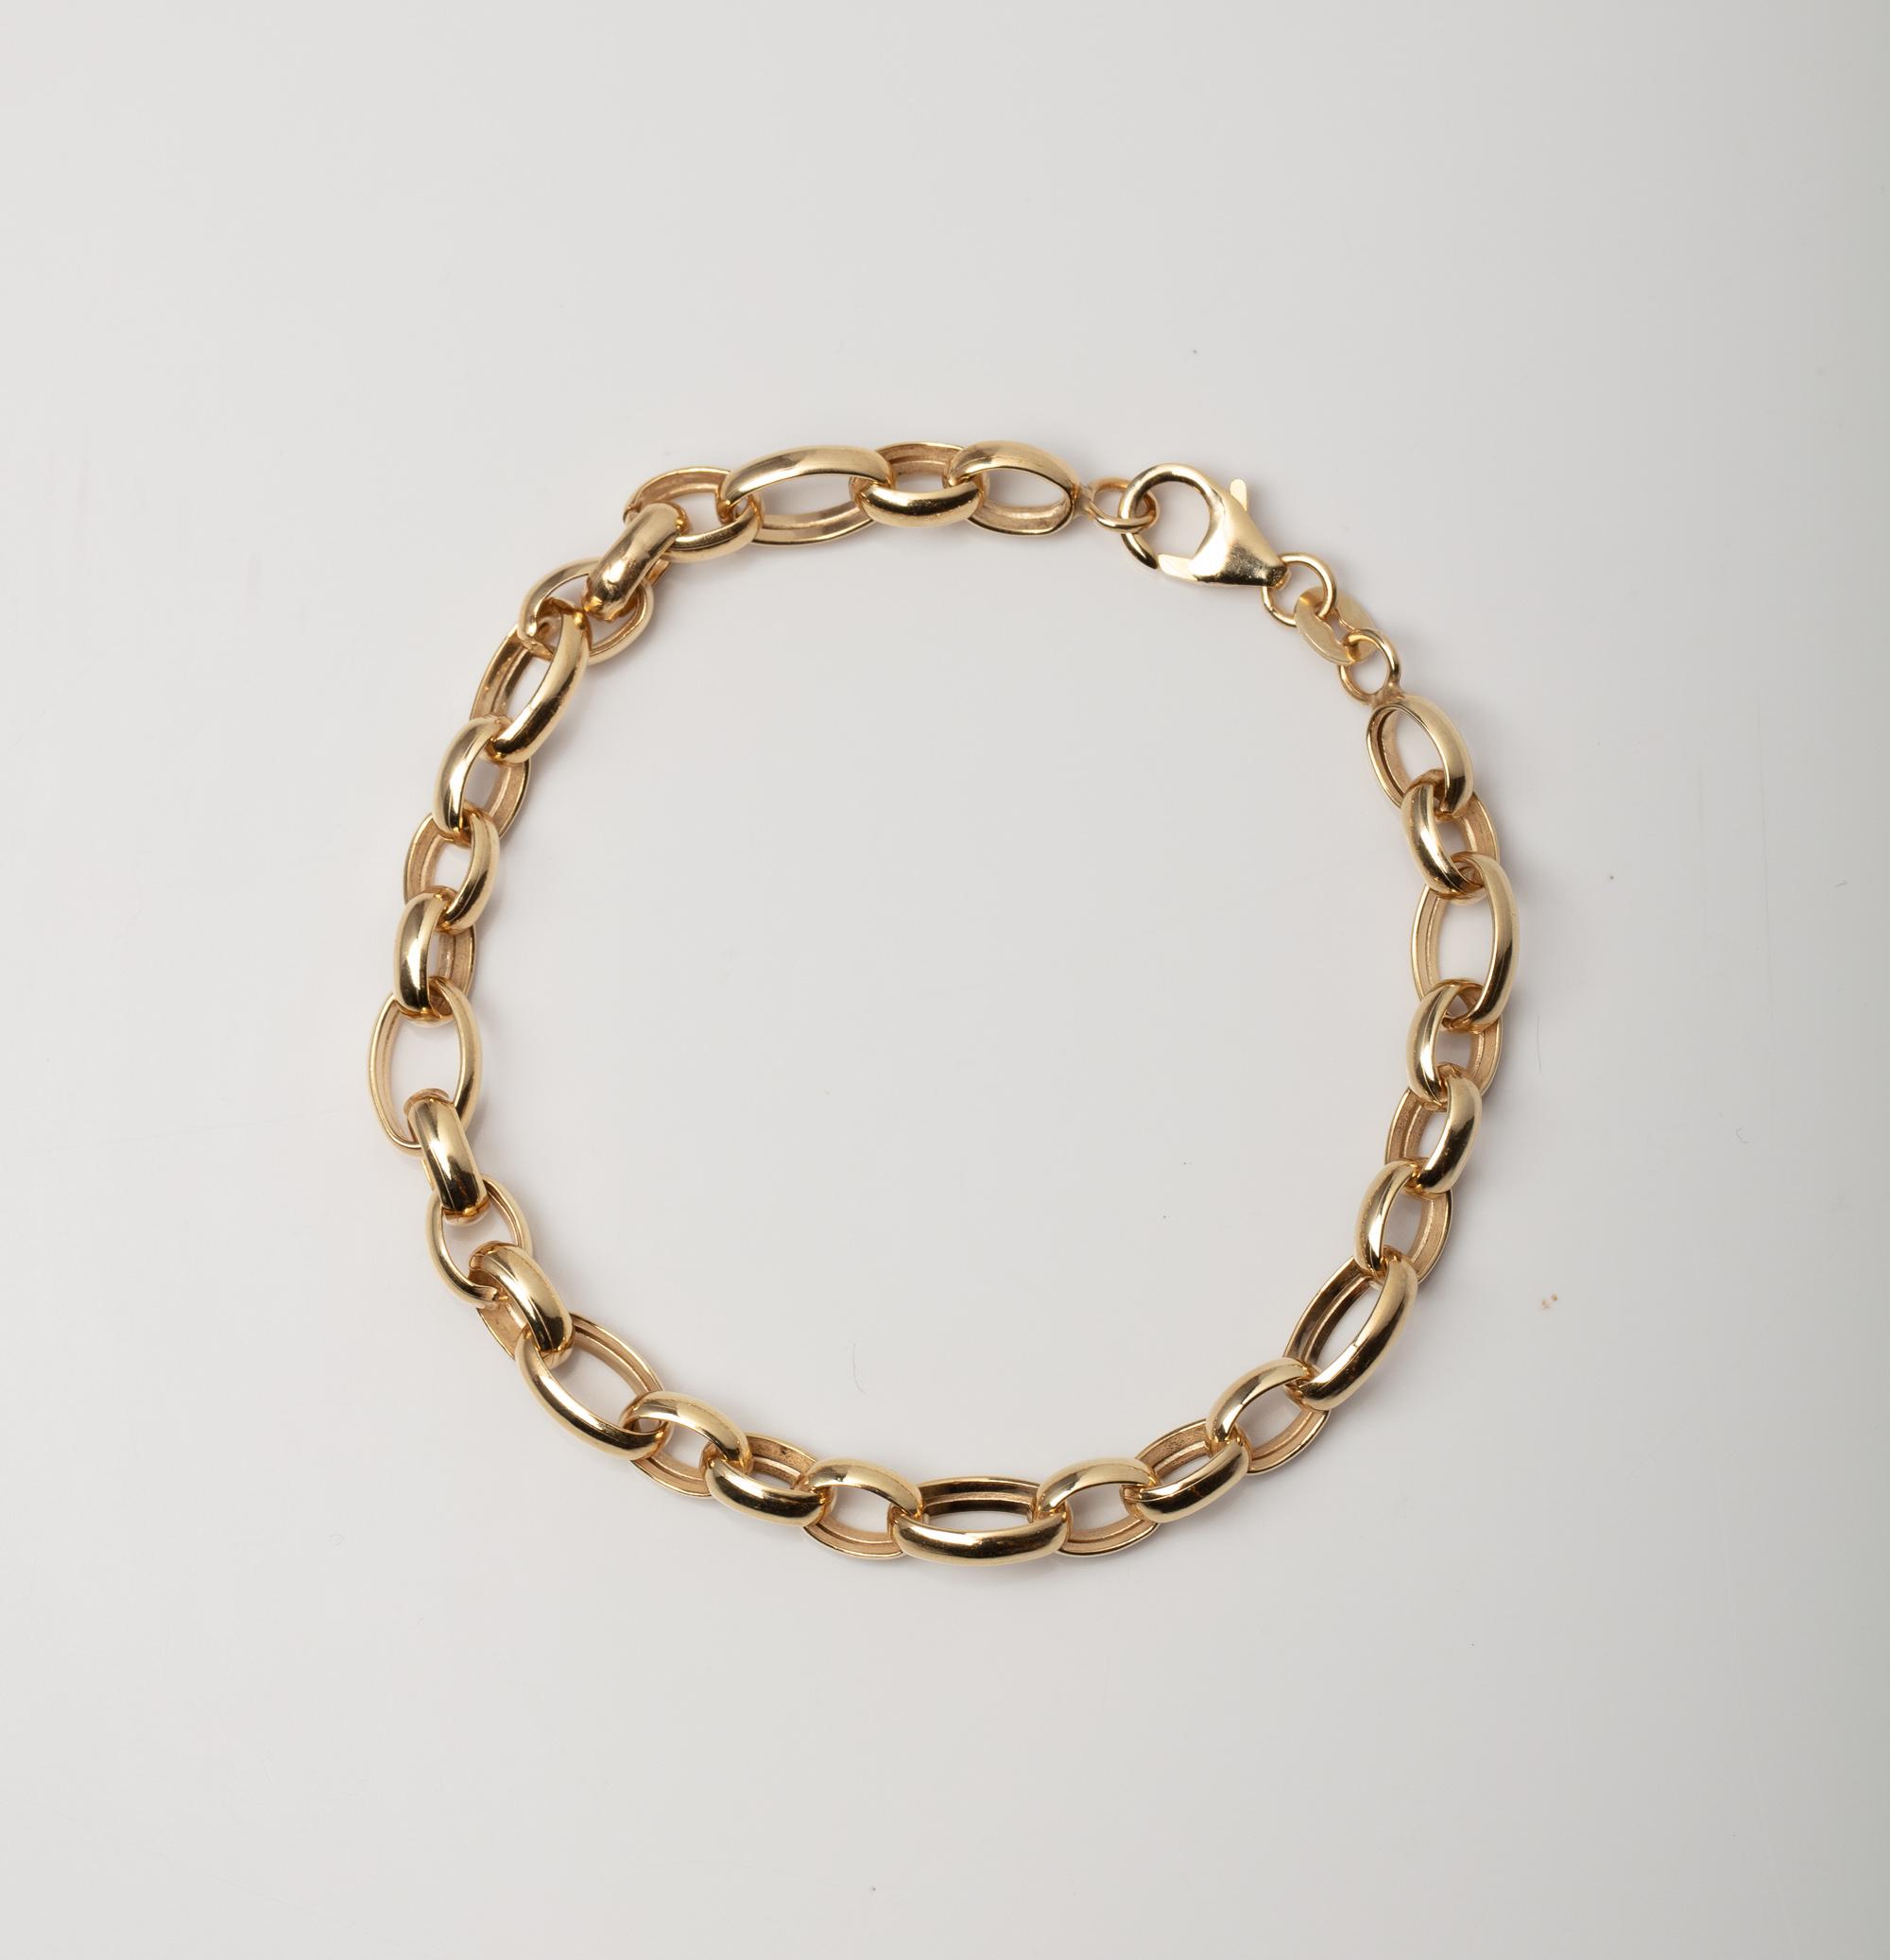 A 9CT GOLD & SILVER BONDED FANCY LINK BRACELET